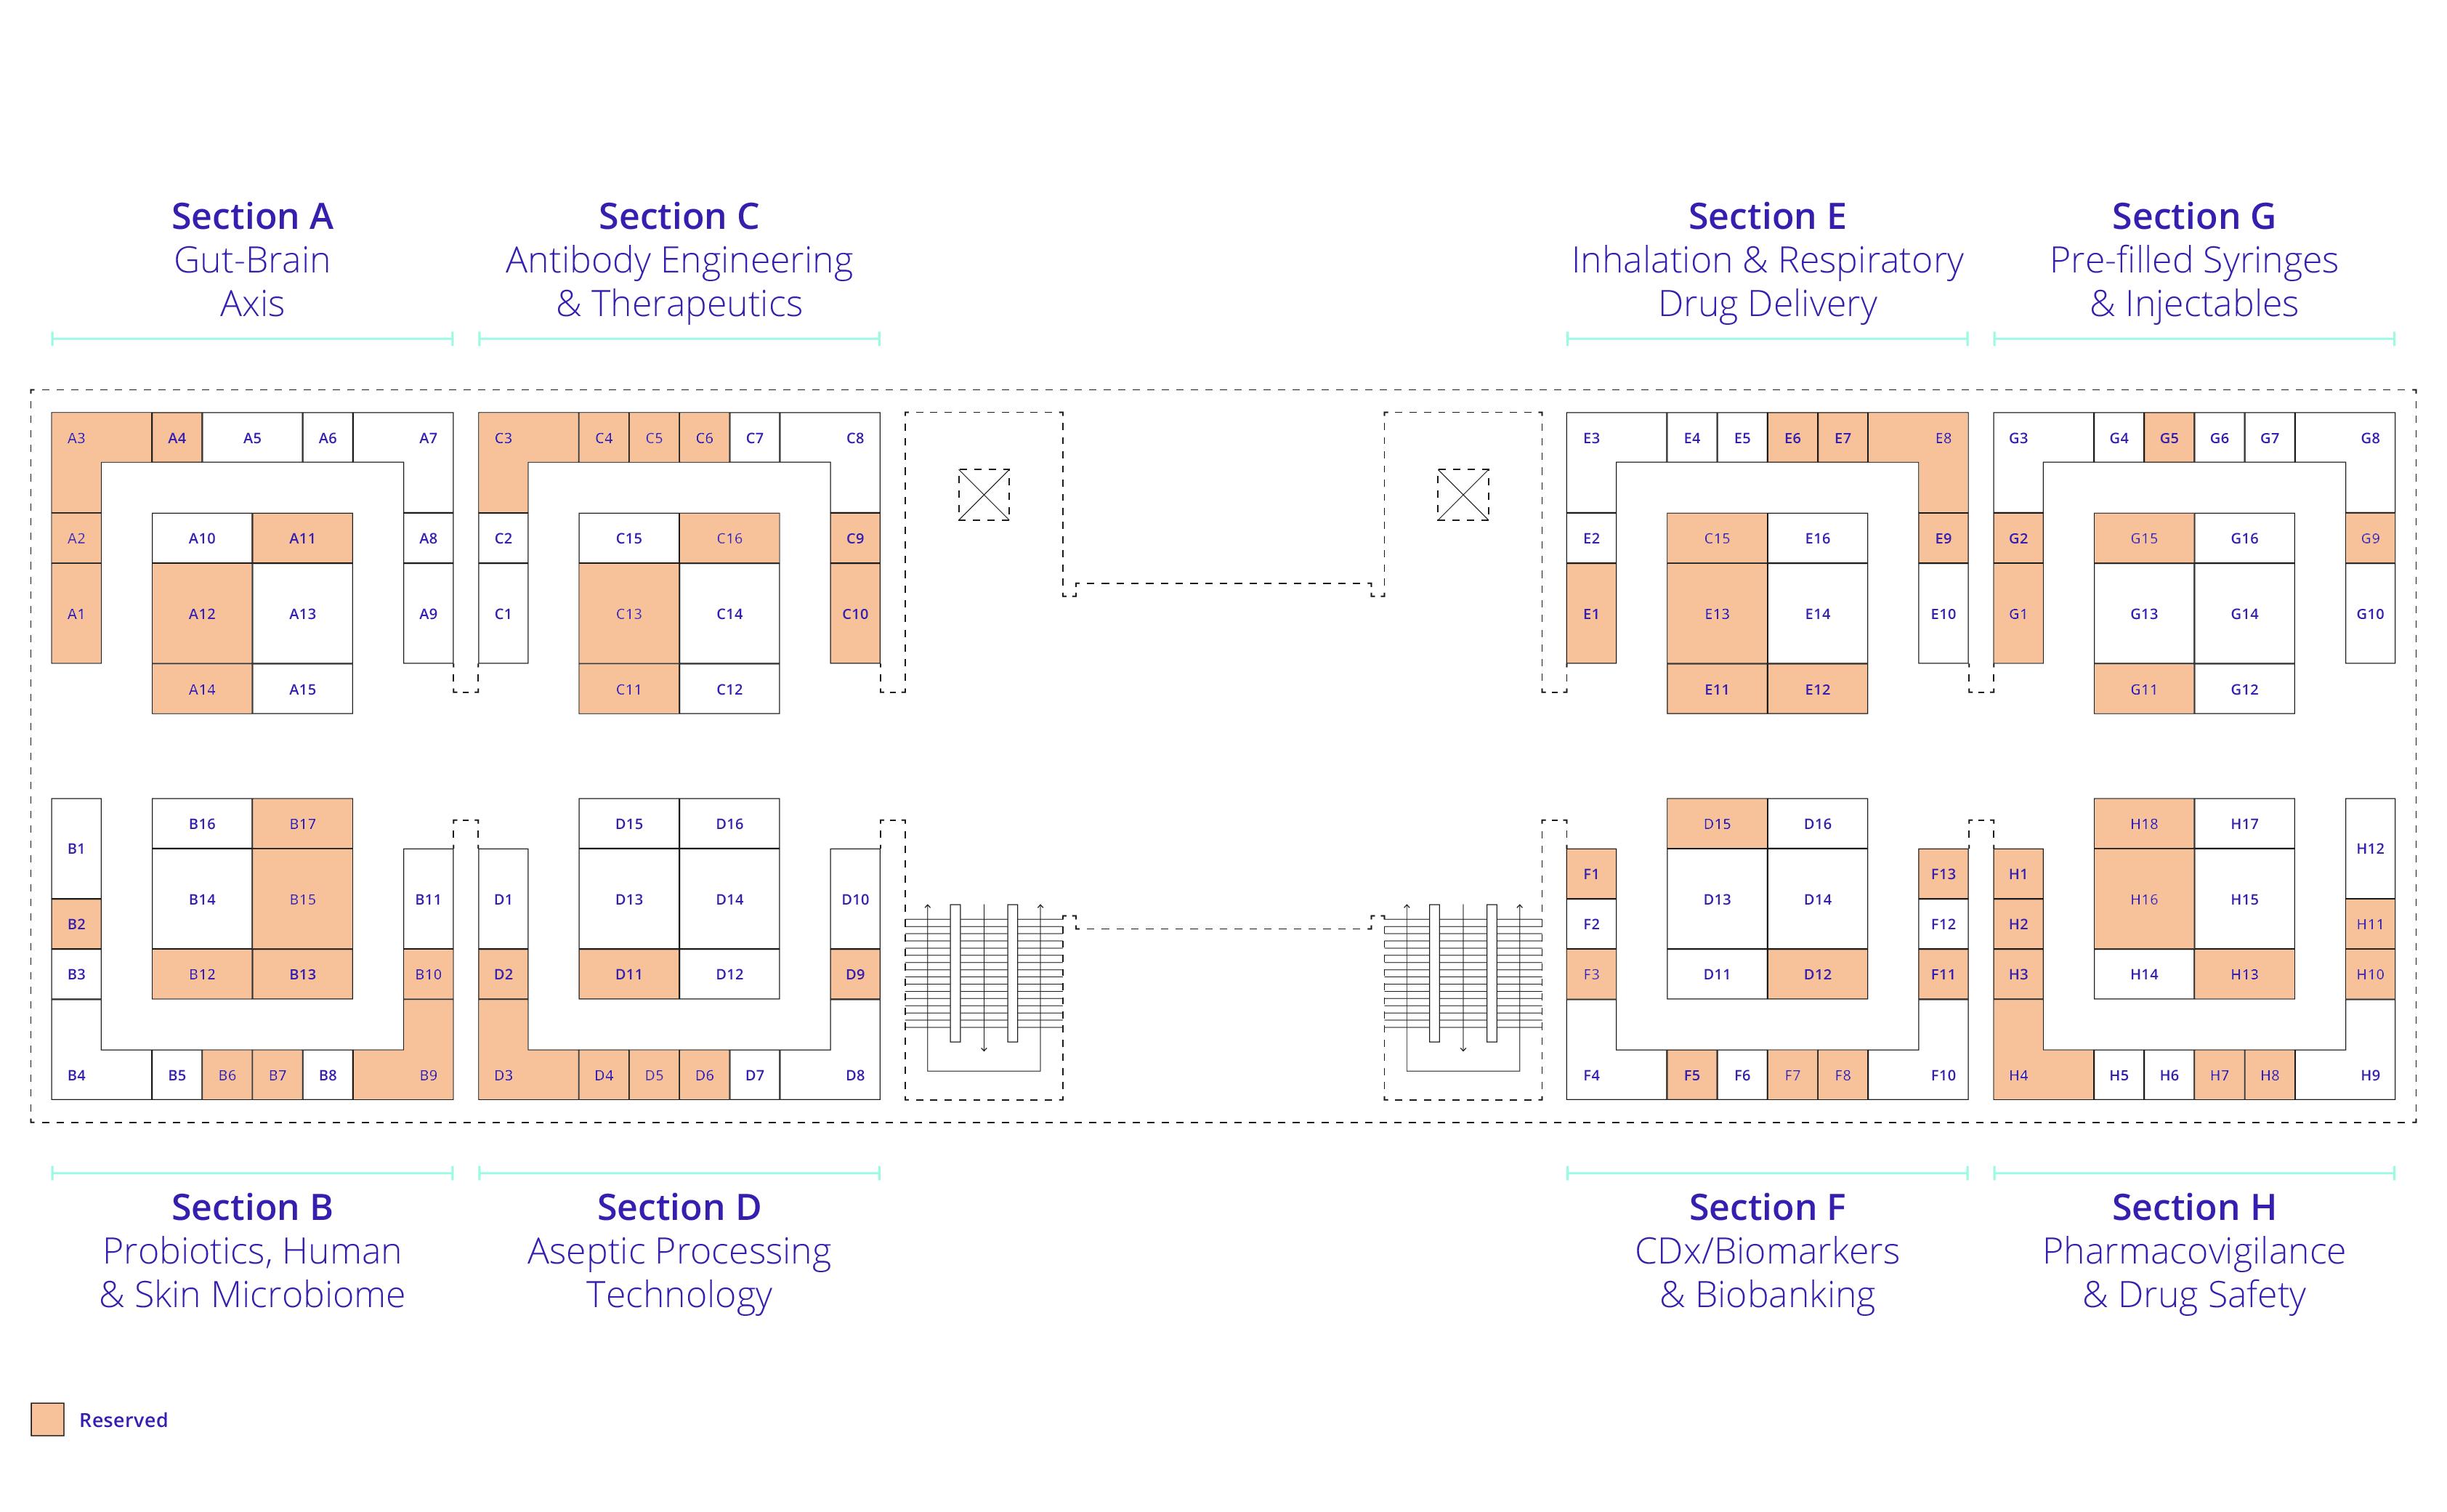 Plant_BioTech_Pharma_Summit_2021_Sponsor_Sep